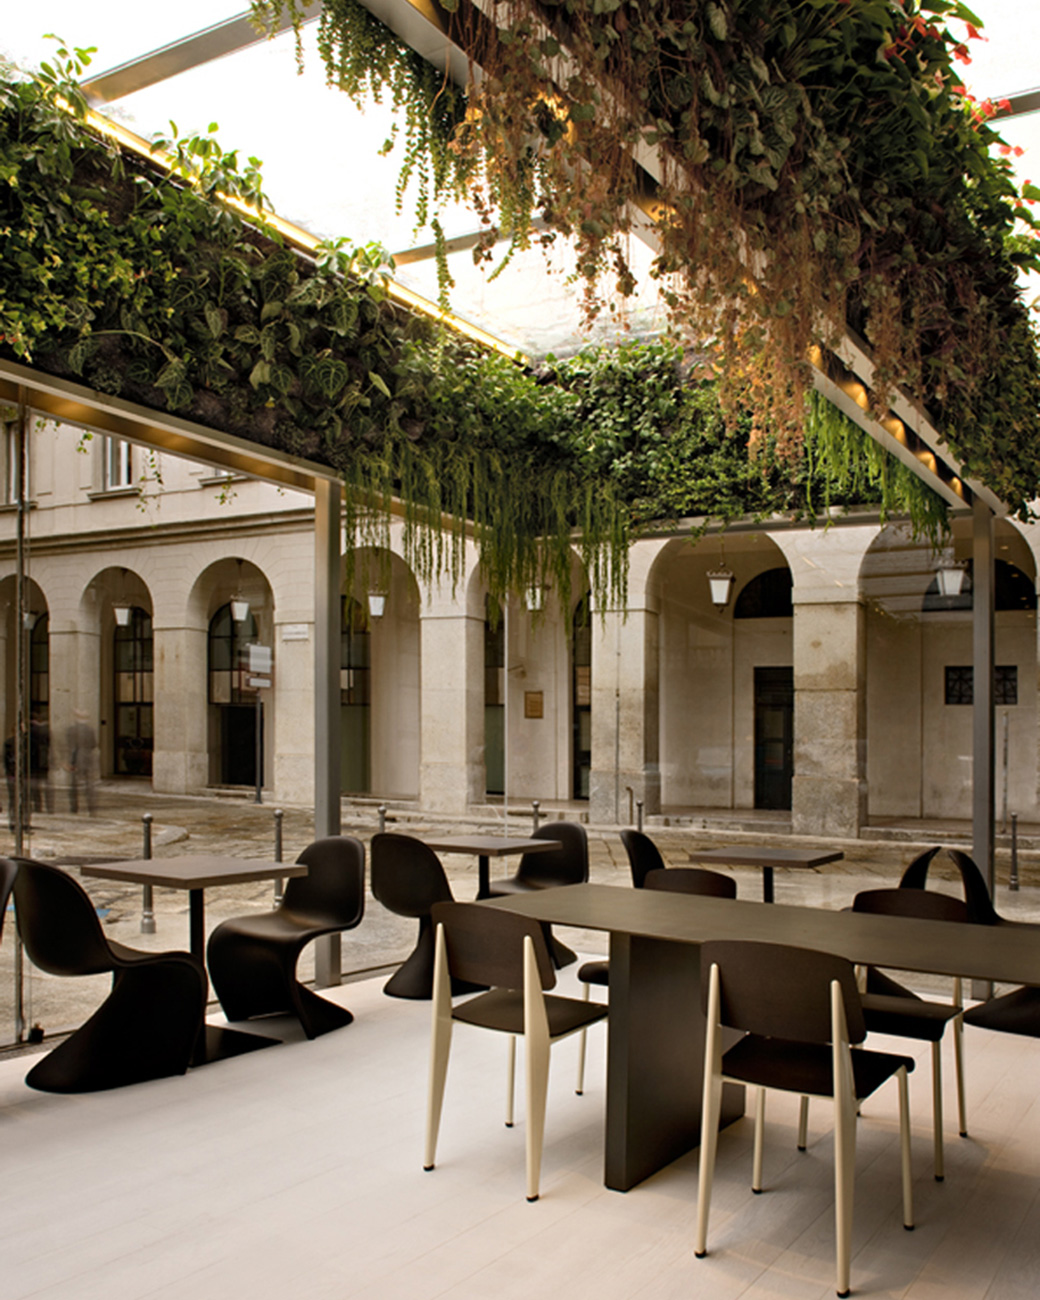 Trussardi Cafe | Quincoces-Dragò & Partners